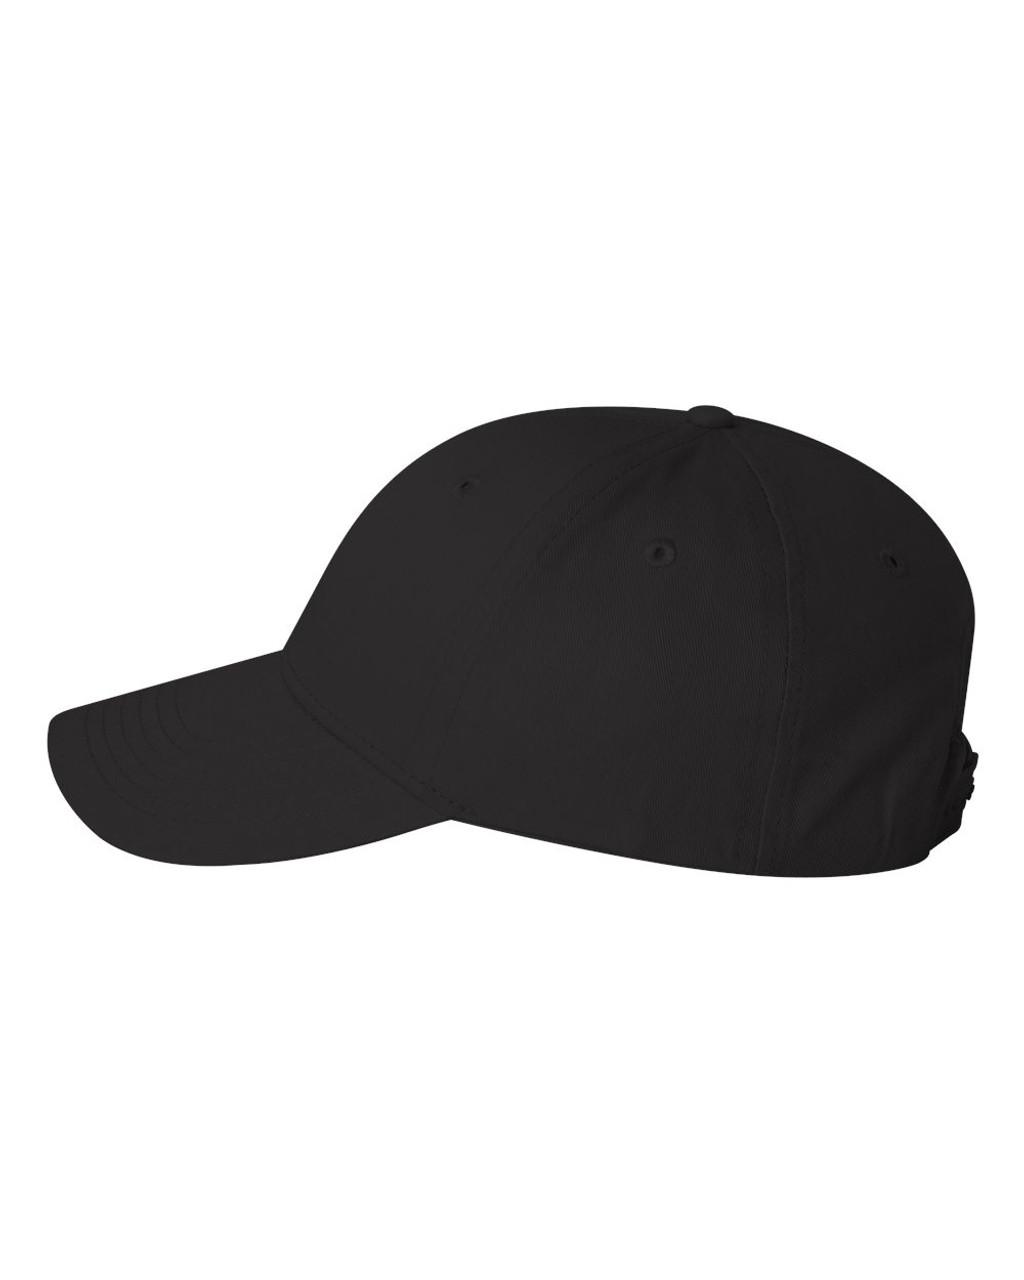 VC100 Valucap Twill Hat | T-shirt.ca